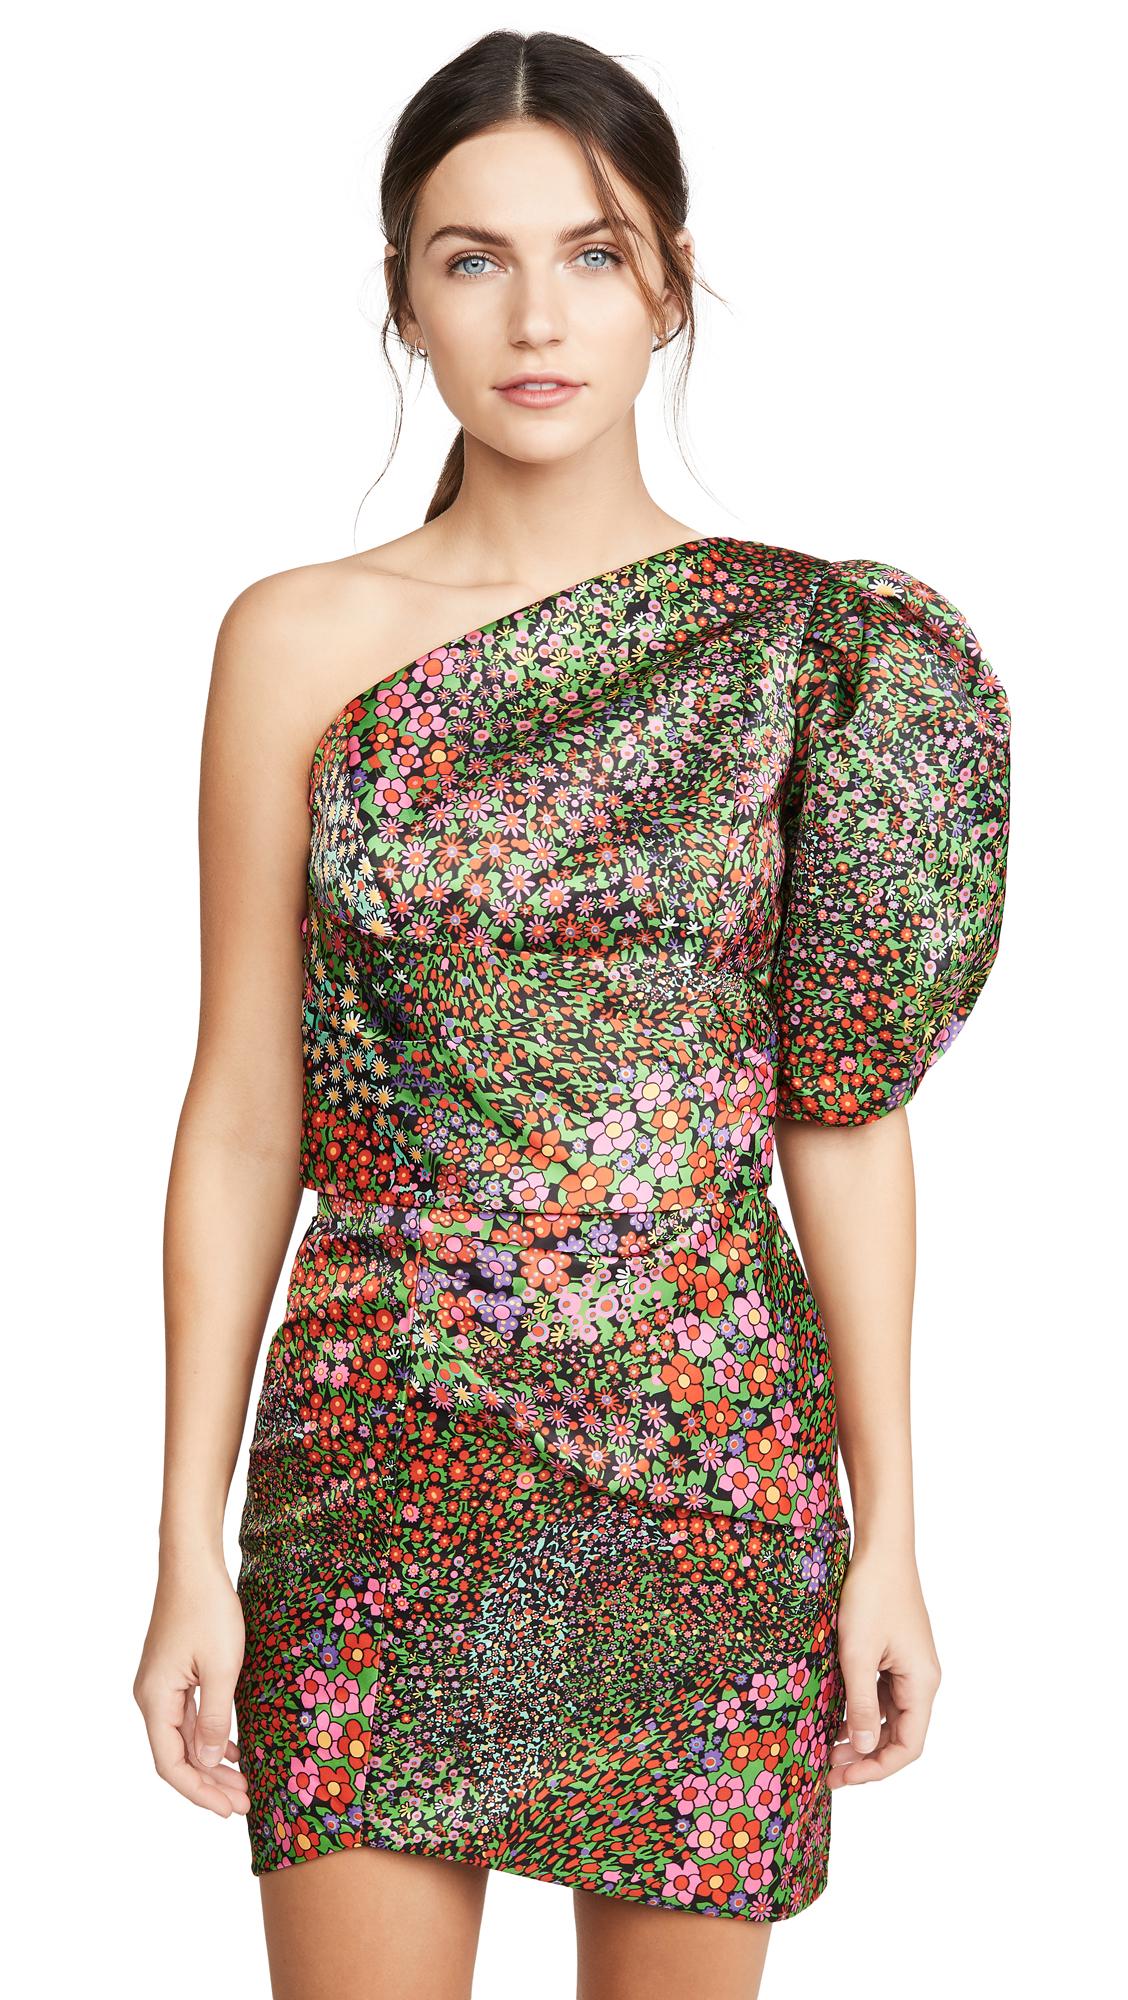 IORANE Multicolor Floral One Shoulder Mini Dress - 50% Off Sale